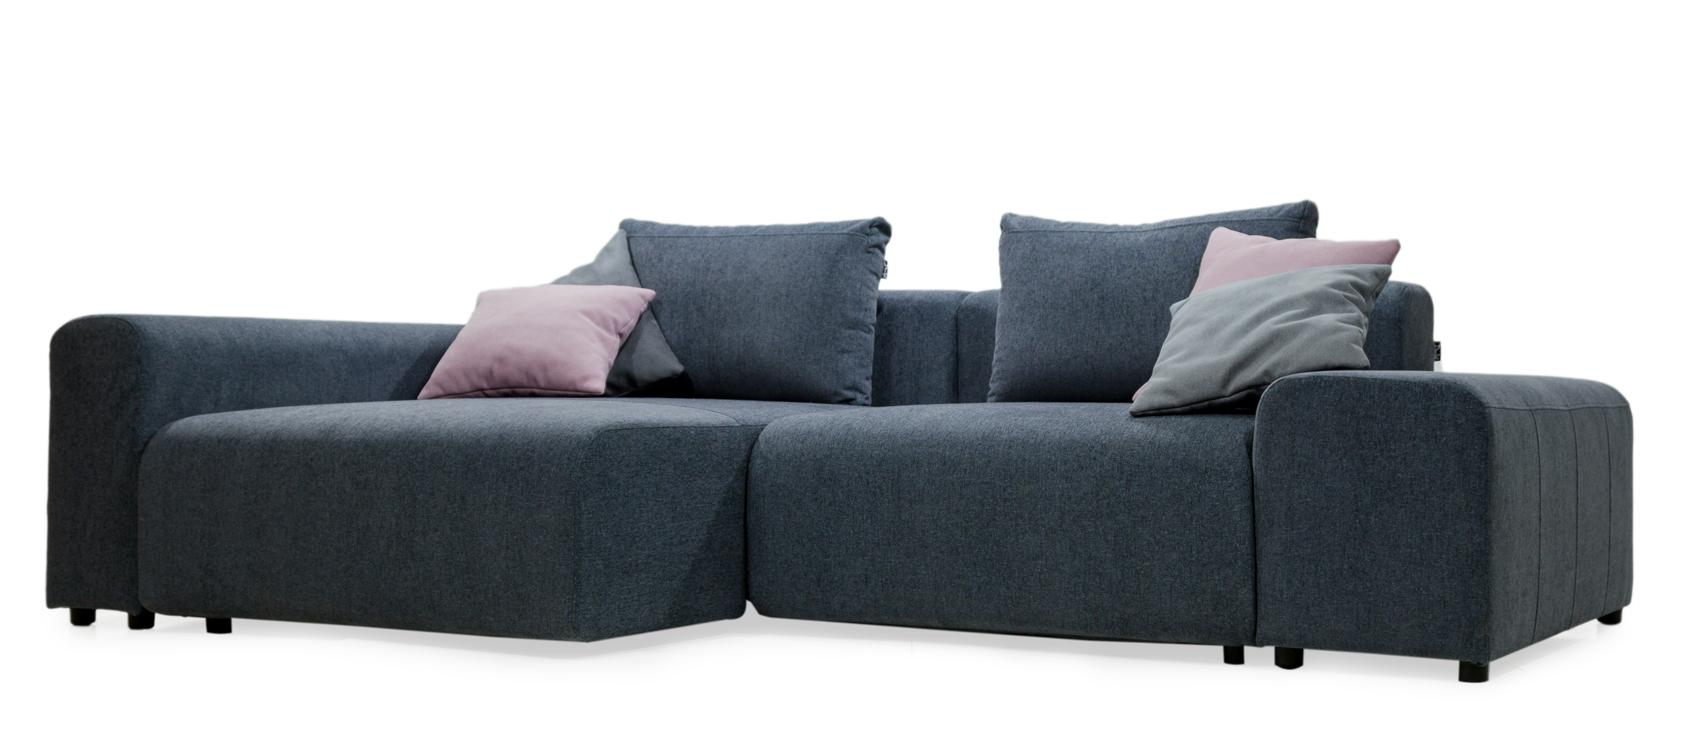 Sofa RAFT фото 12